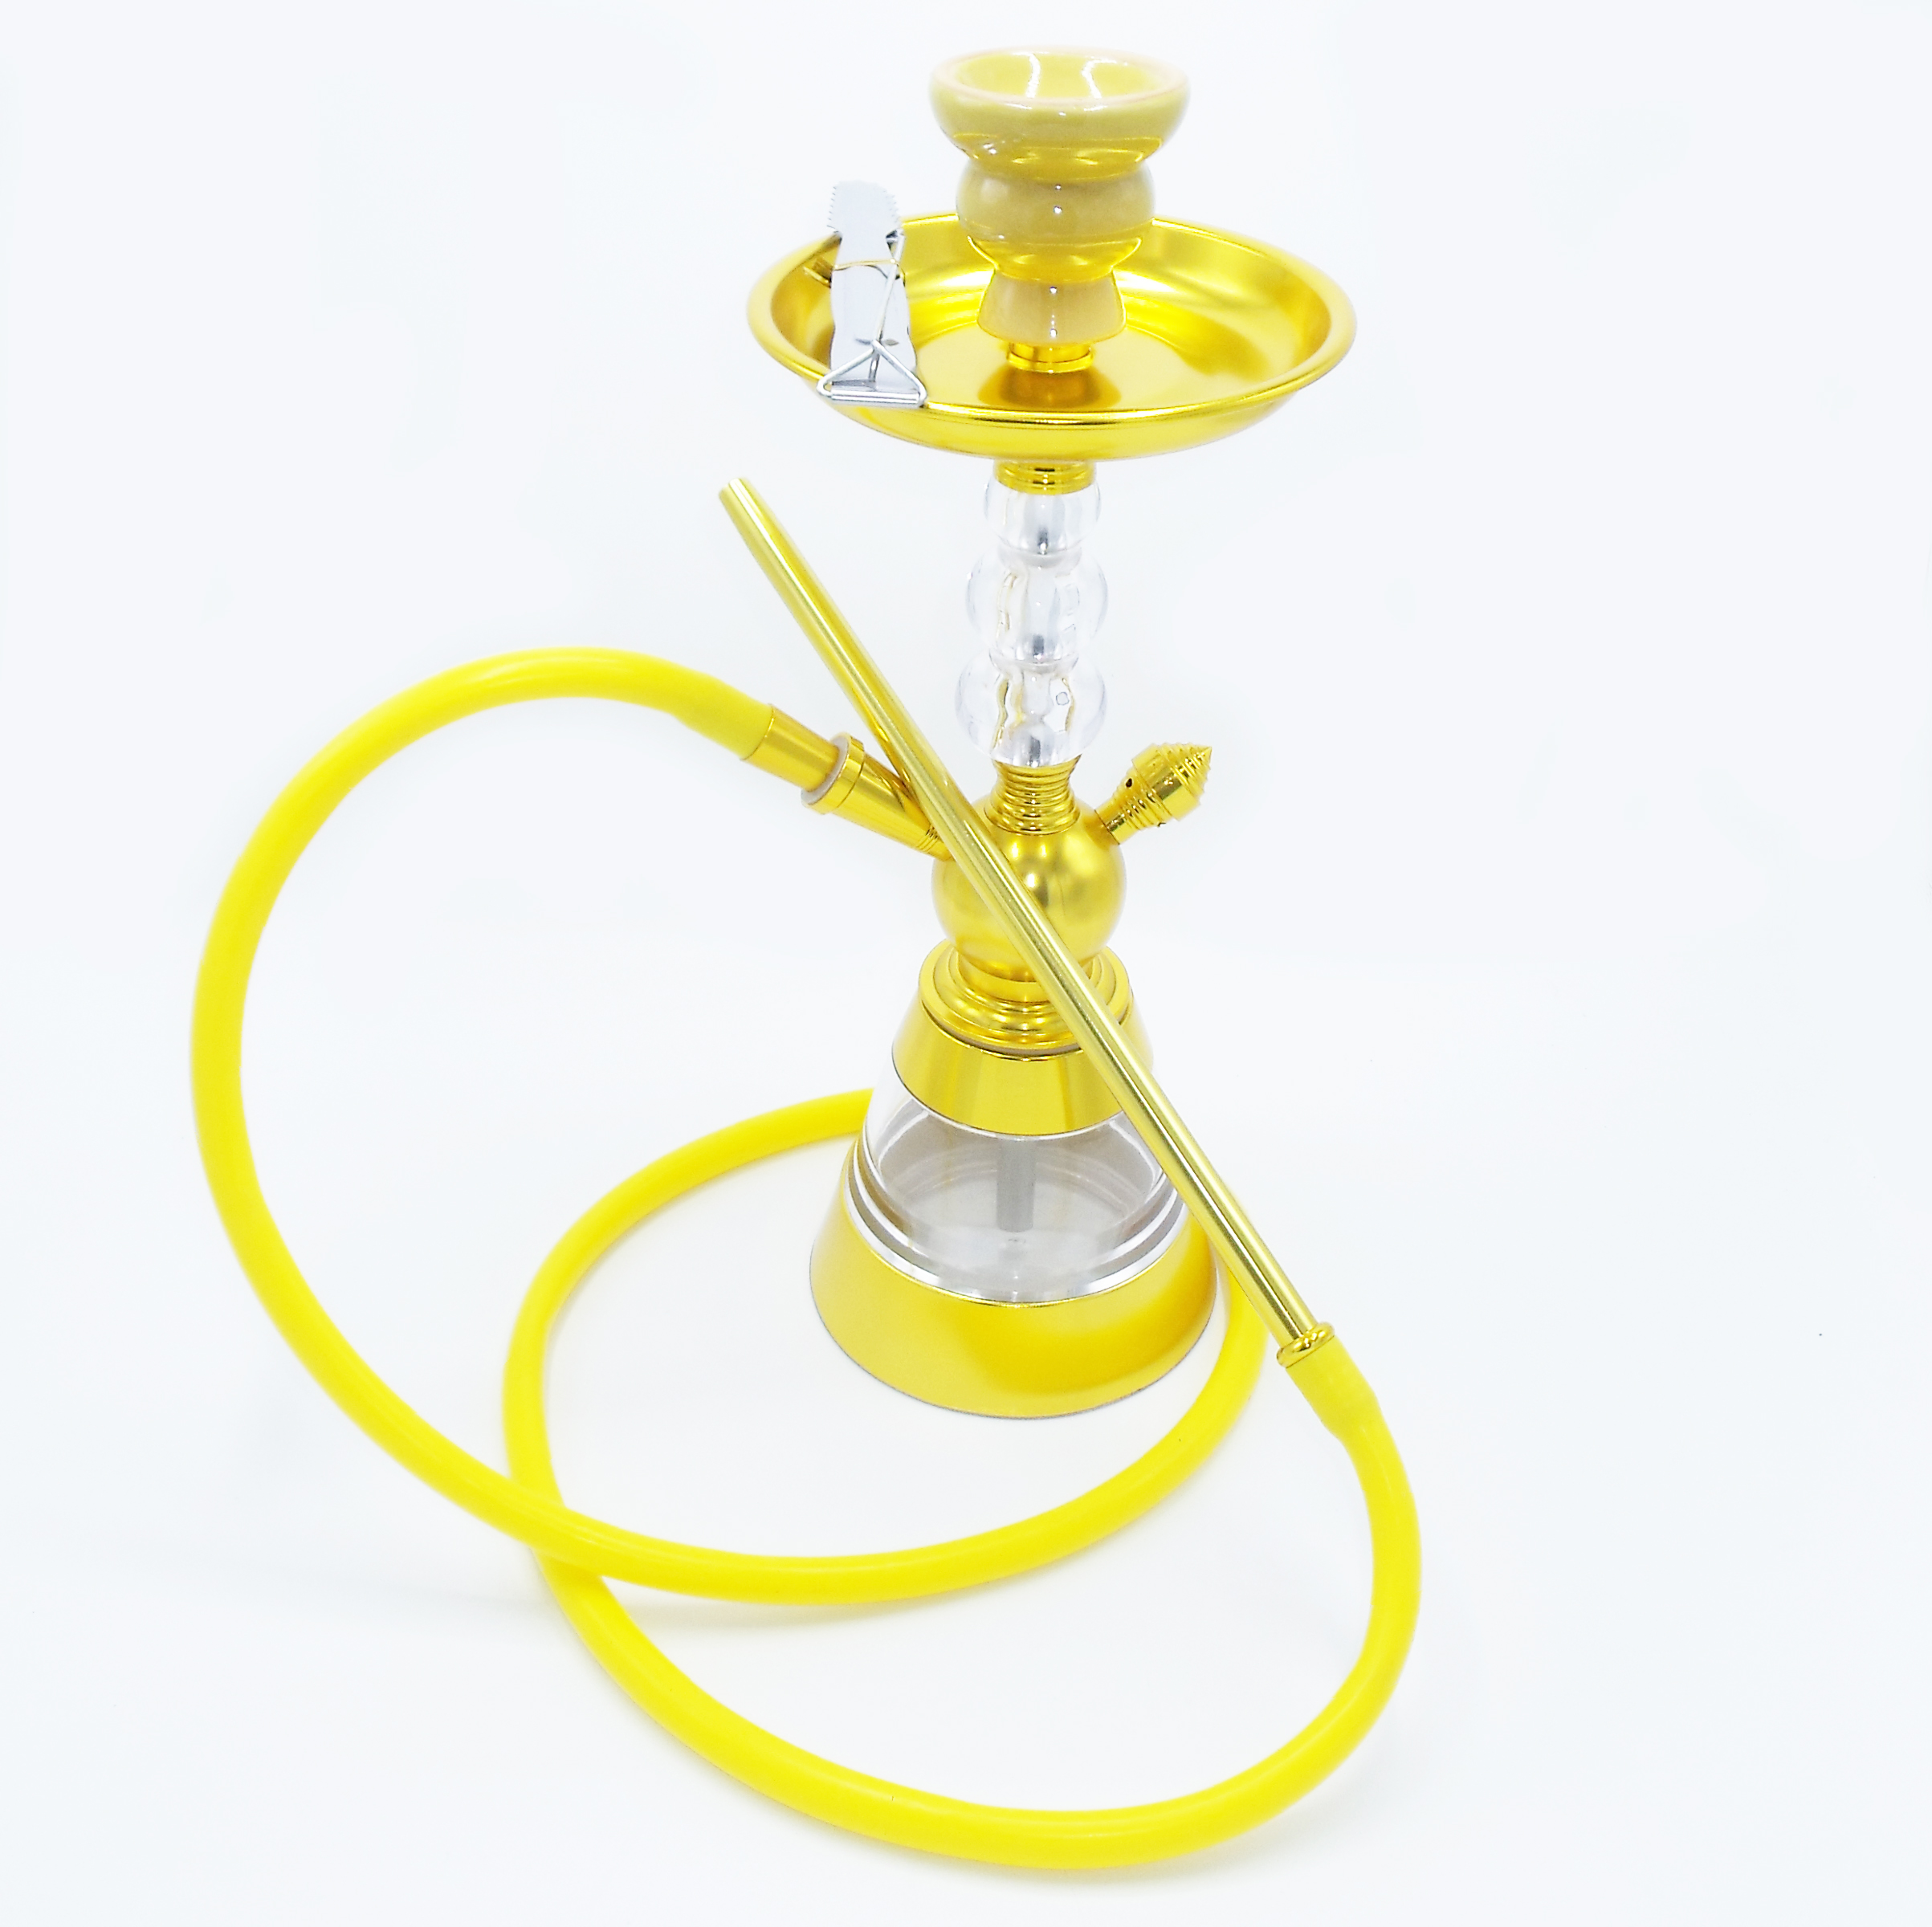 2019 Hot Sale New Design Hookah Acrylic Shisha Hookah Set - Buy Acrylic  Shisha Hookah Set,Hookah Shisha,Colorful Shisha Product on Alibaba com